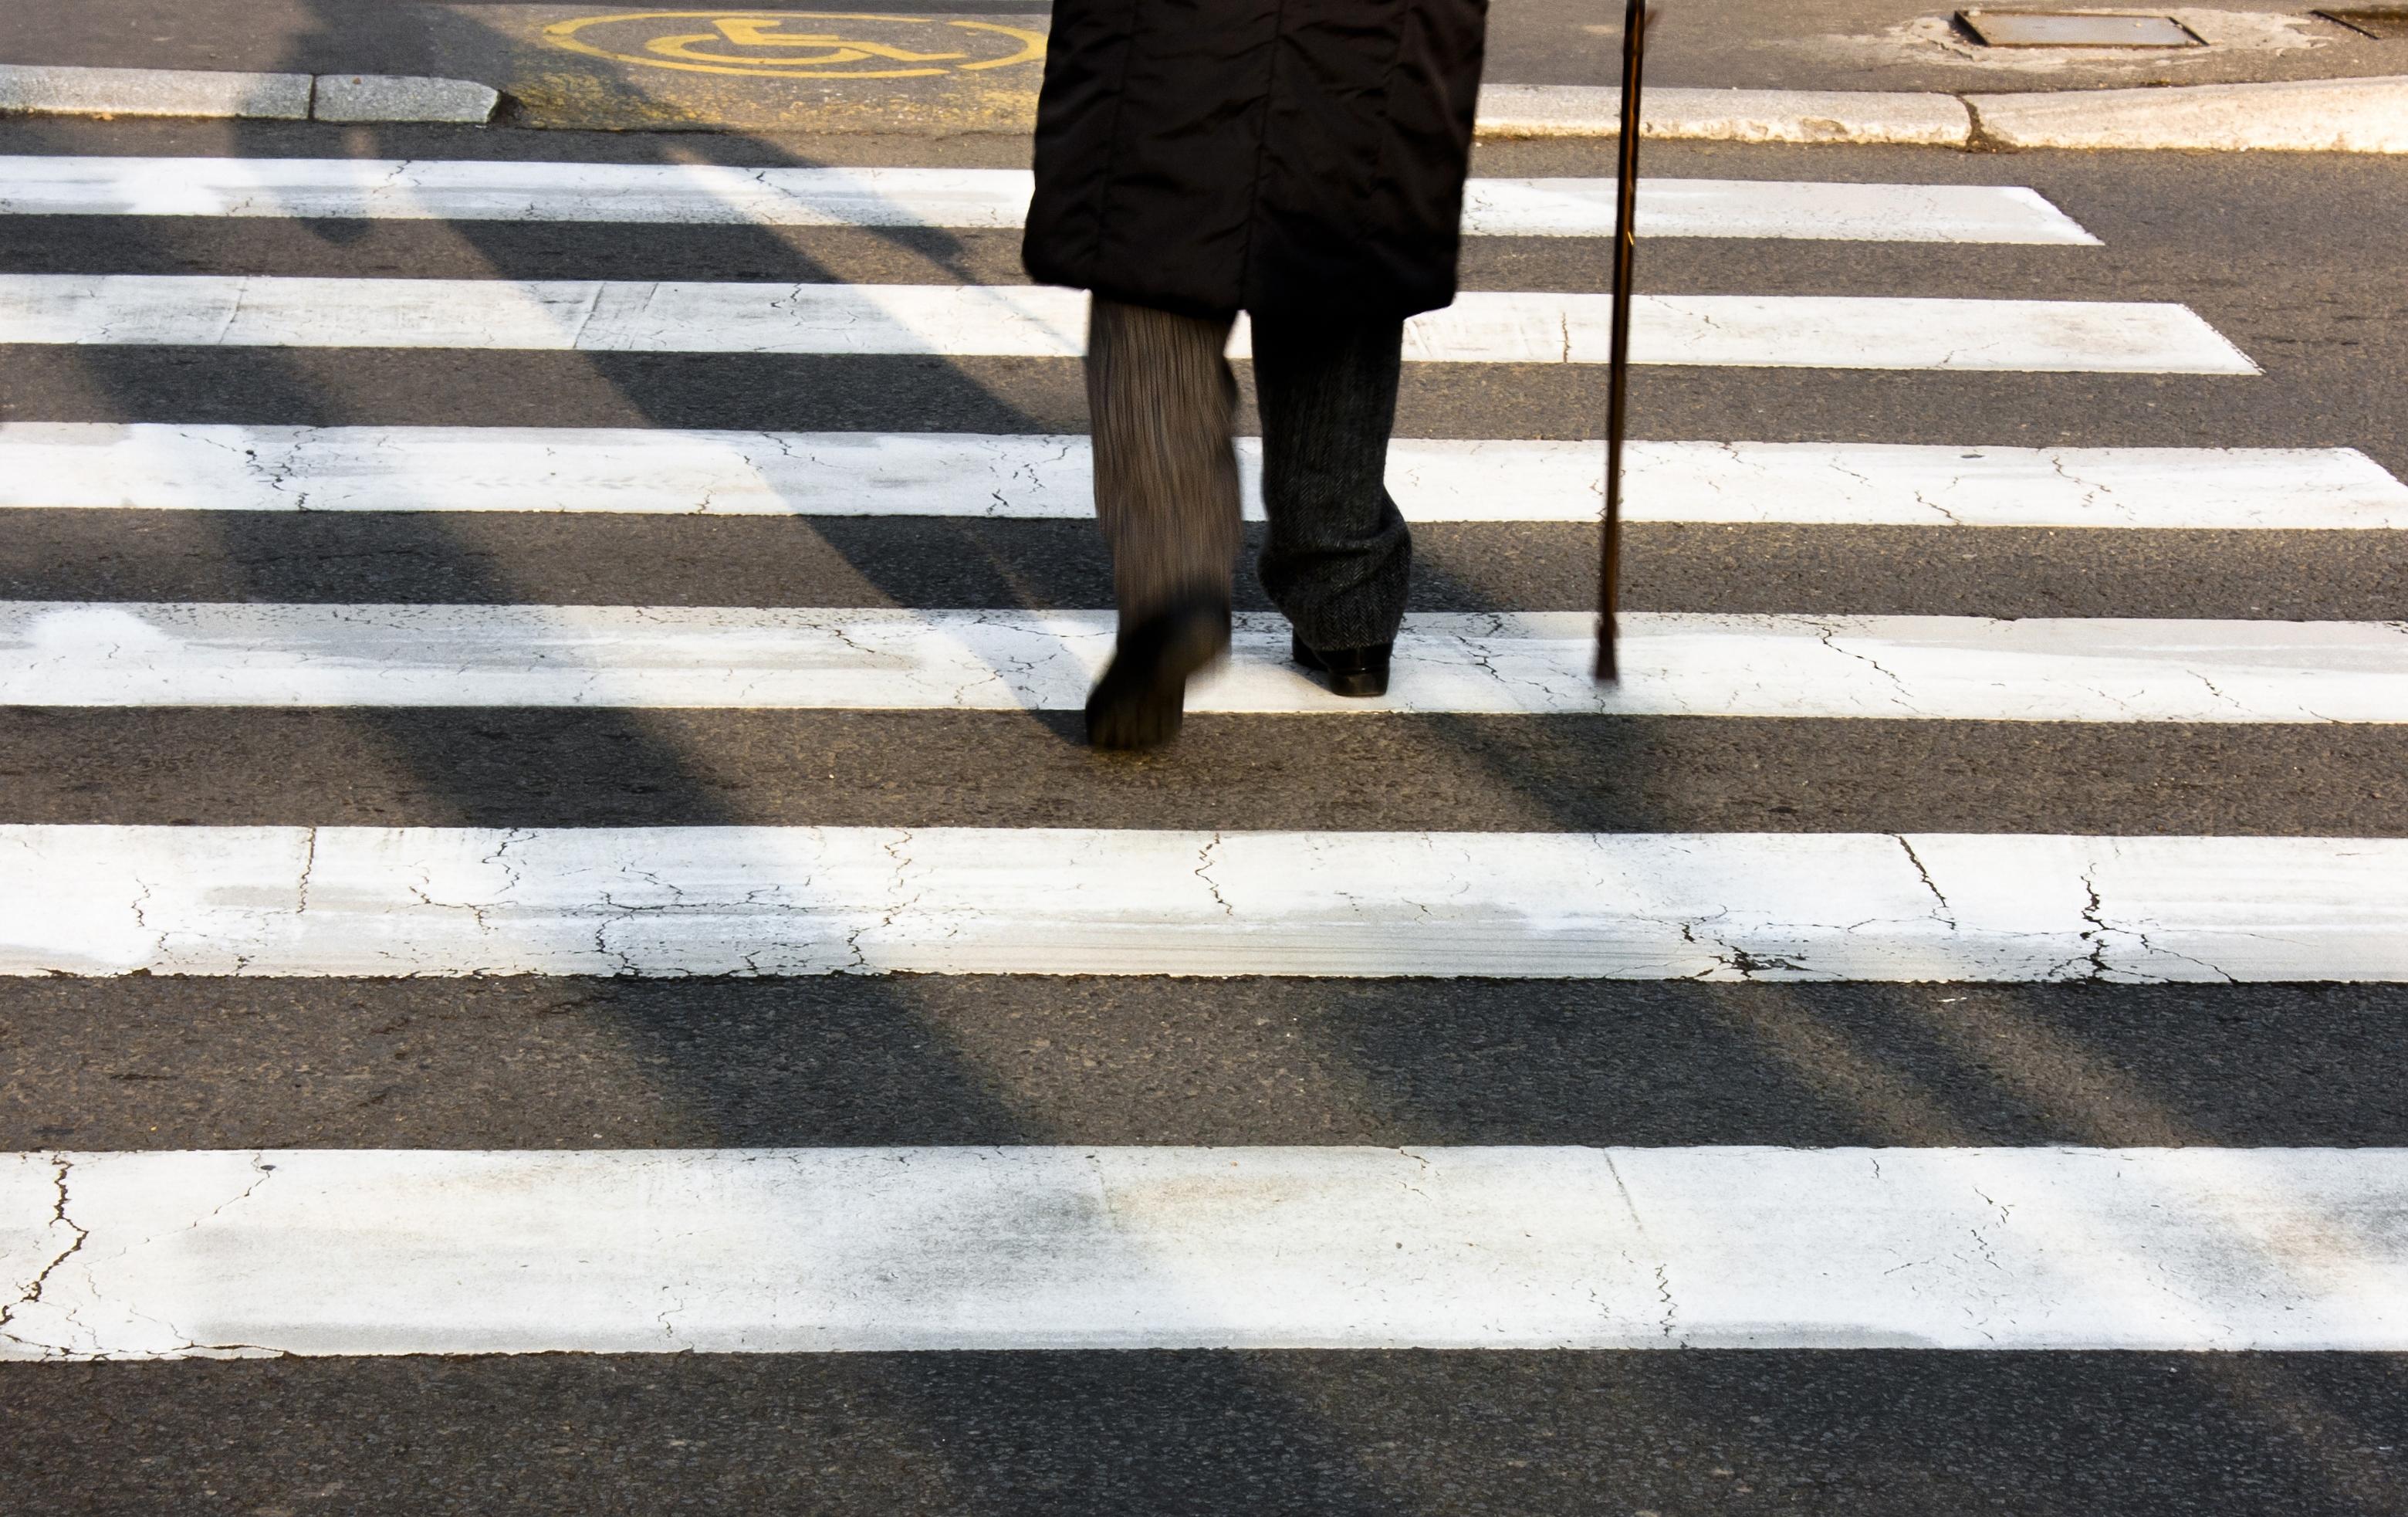 Older gentleman crosses the street using a cane